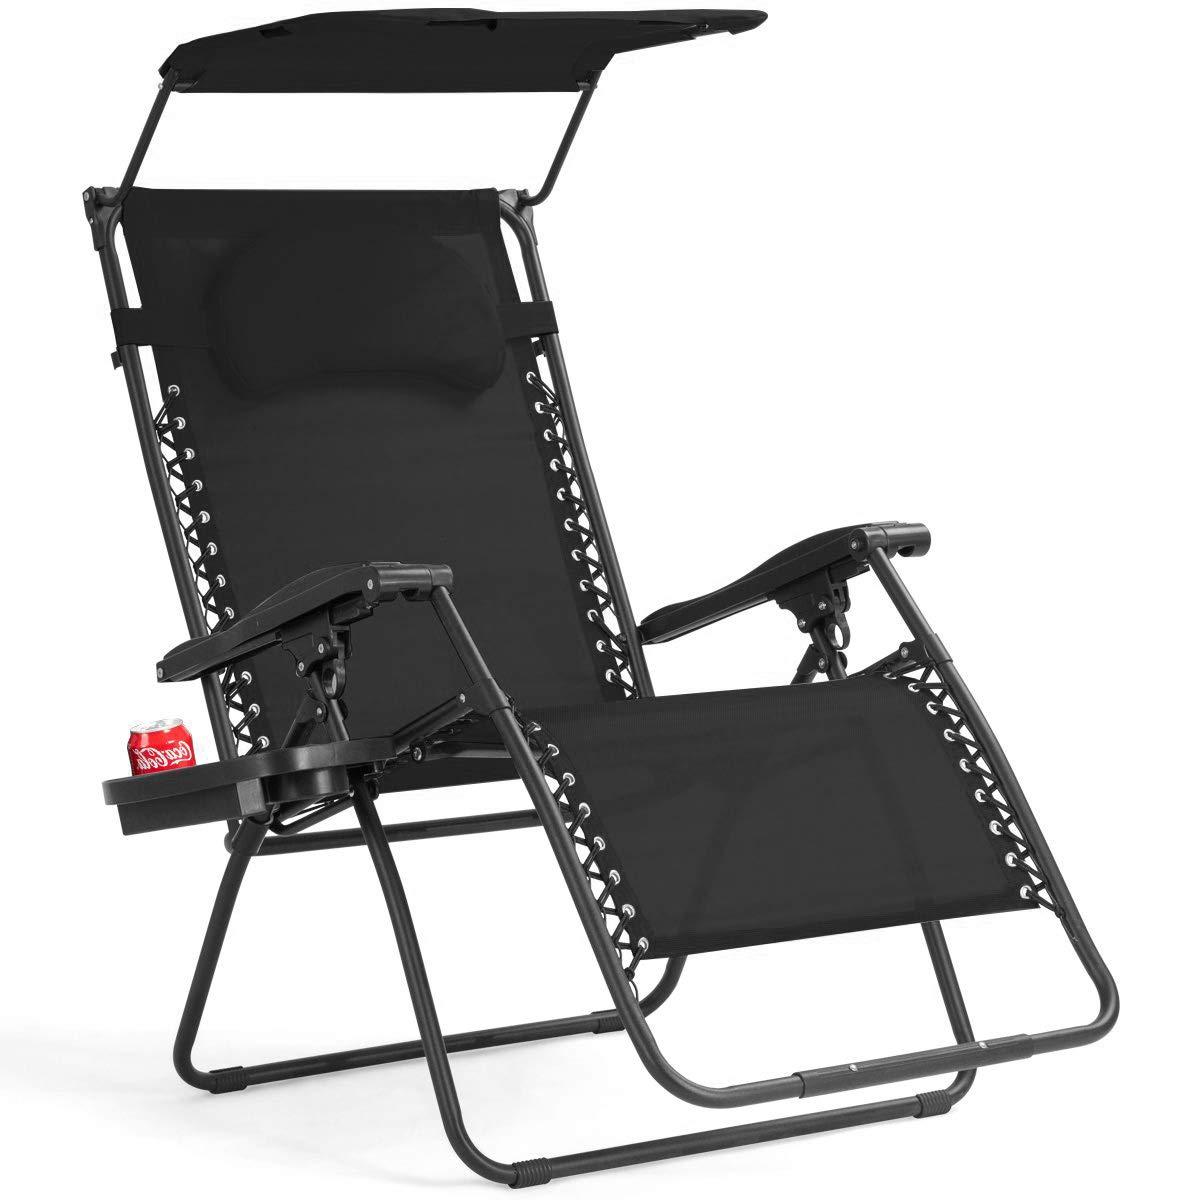 Goplus Folding Zero Gravity Lounge Chair Wide Recliner for Outdoor Beach Patio Pool w/Shade Canopy (Black Zero Gravity Chair)